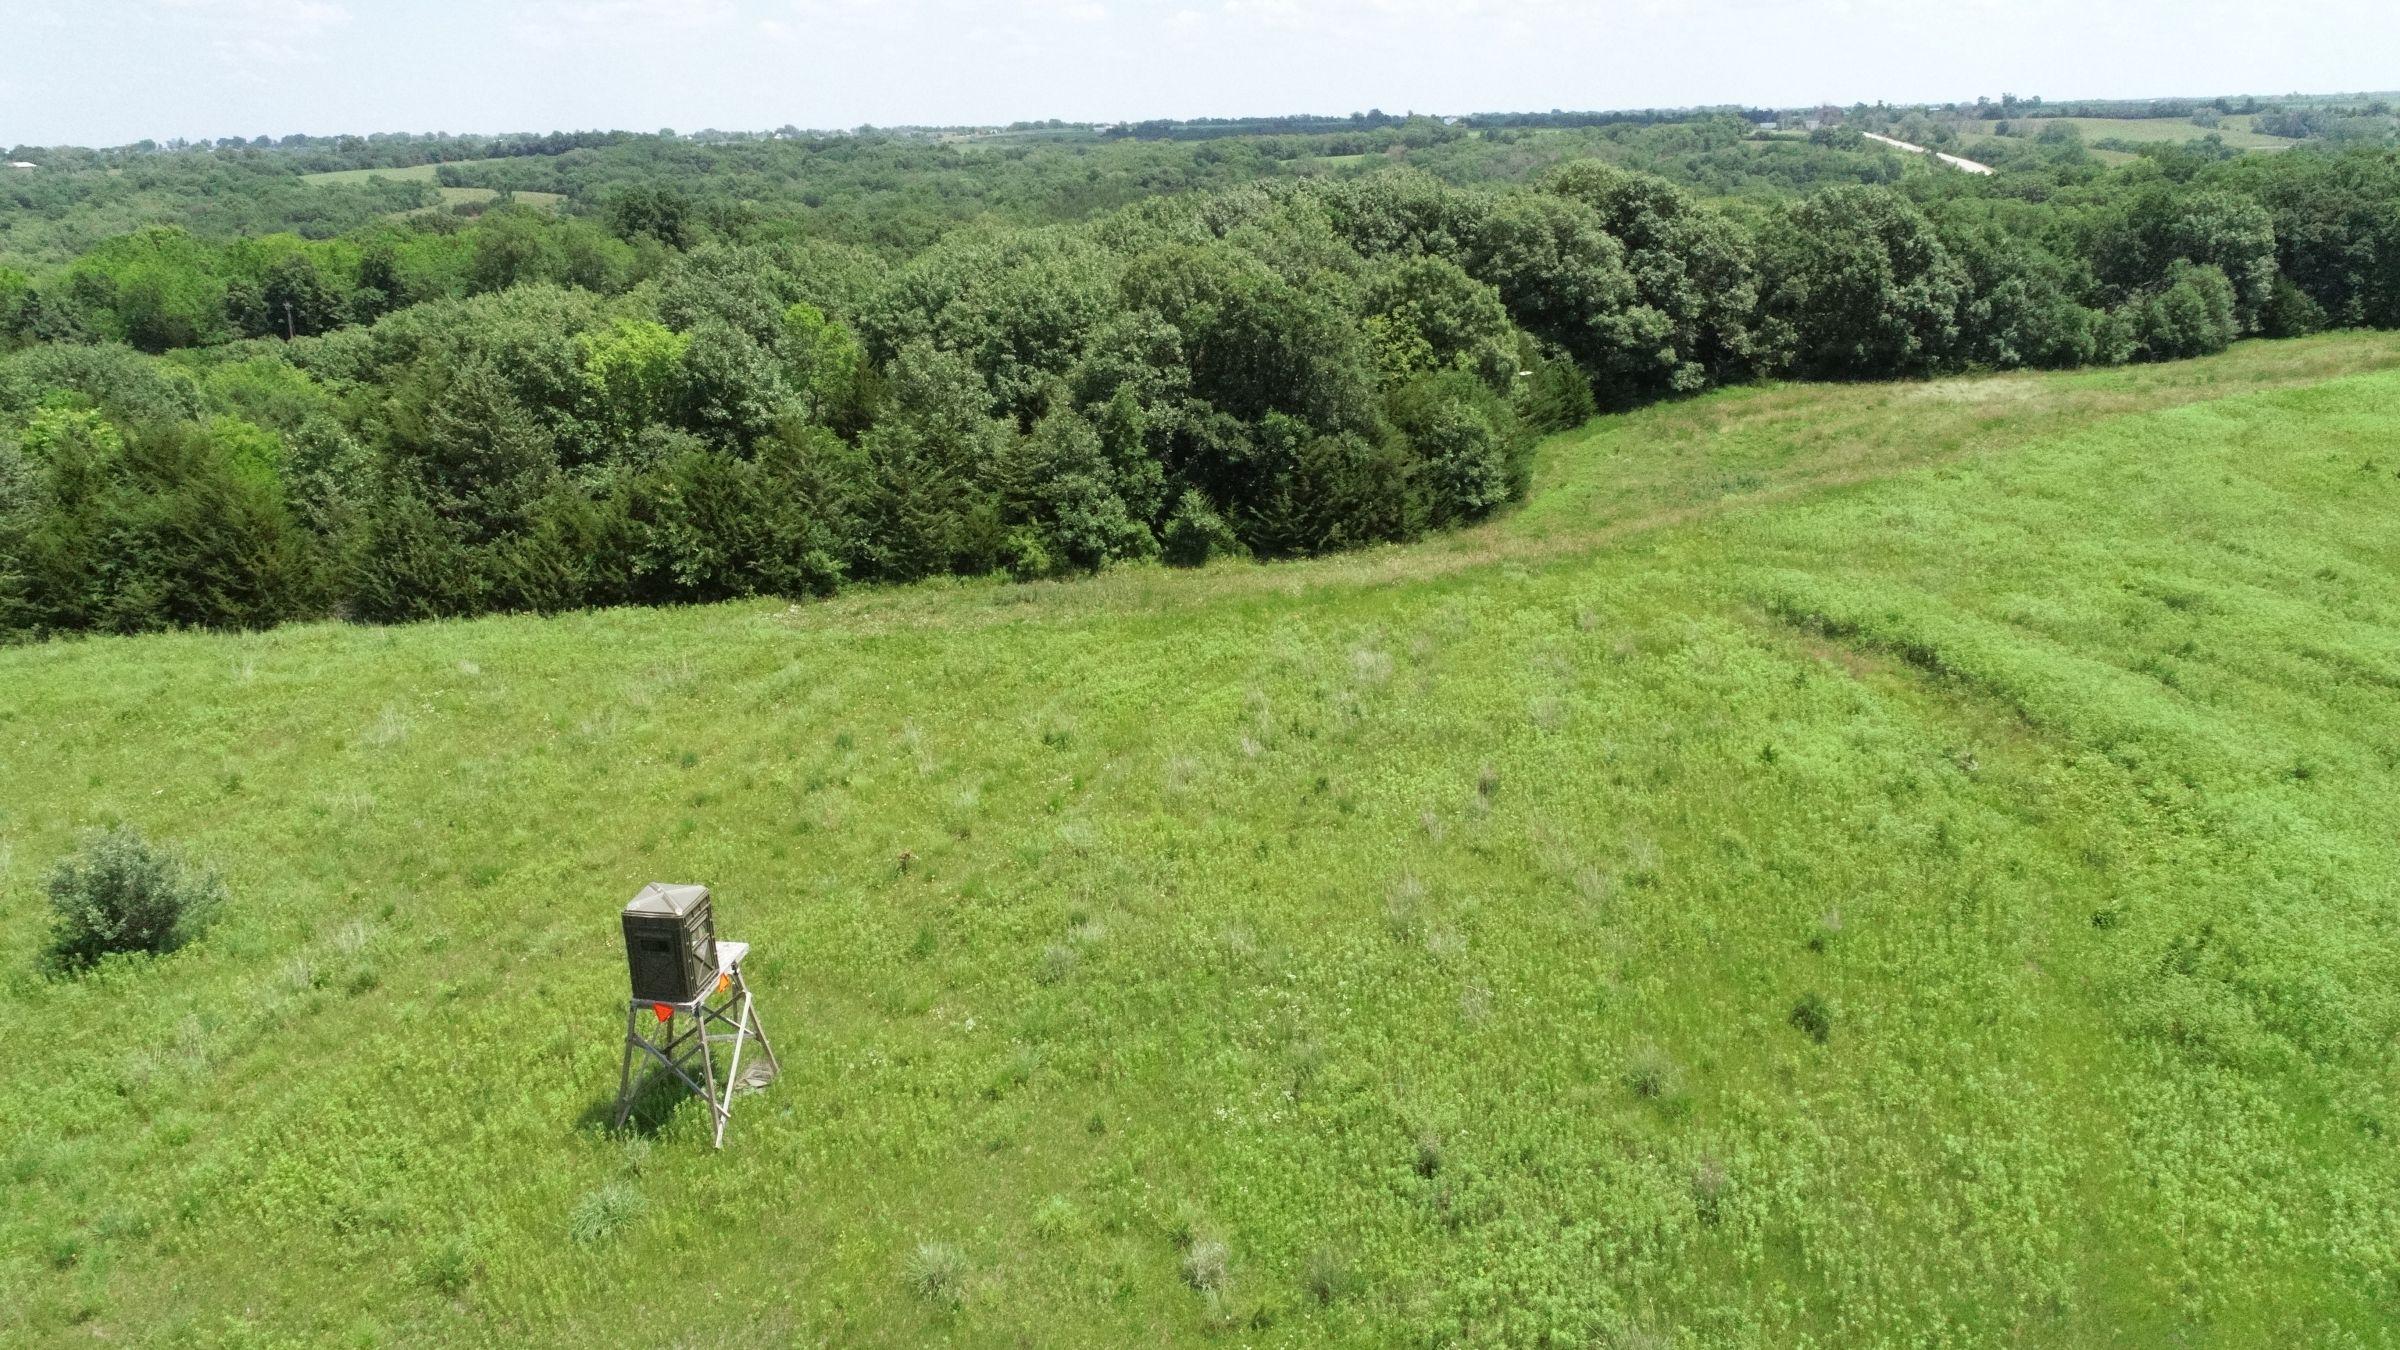 land-warren-county-iowa-29-acres-listing-number-15622-0-2021-07-02-190404.JPG